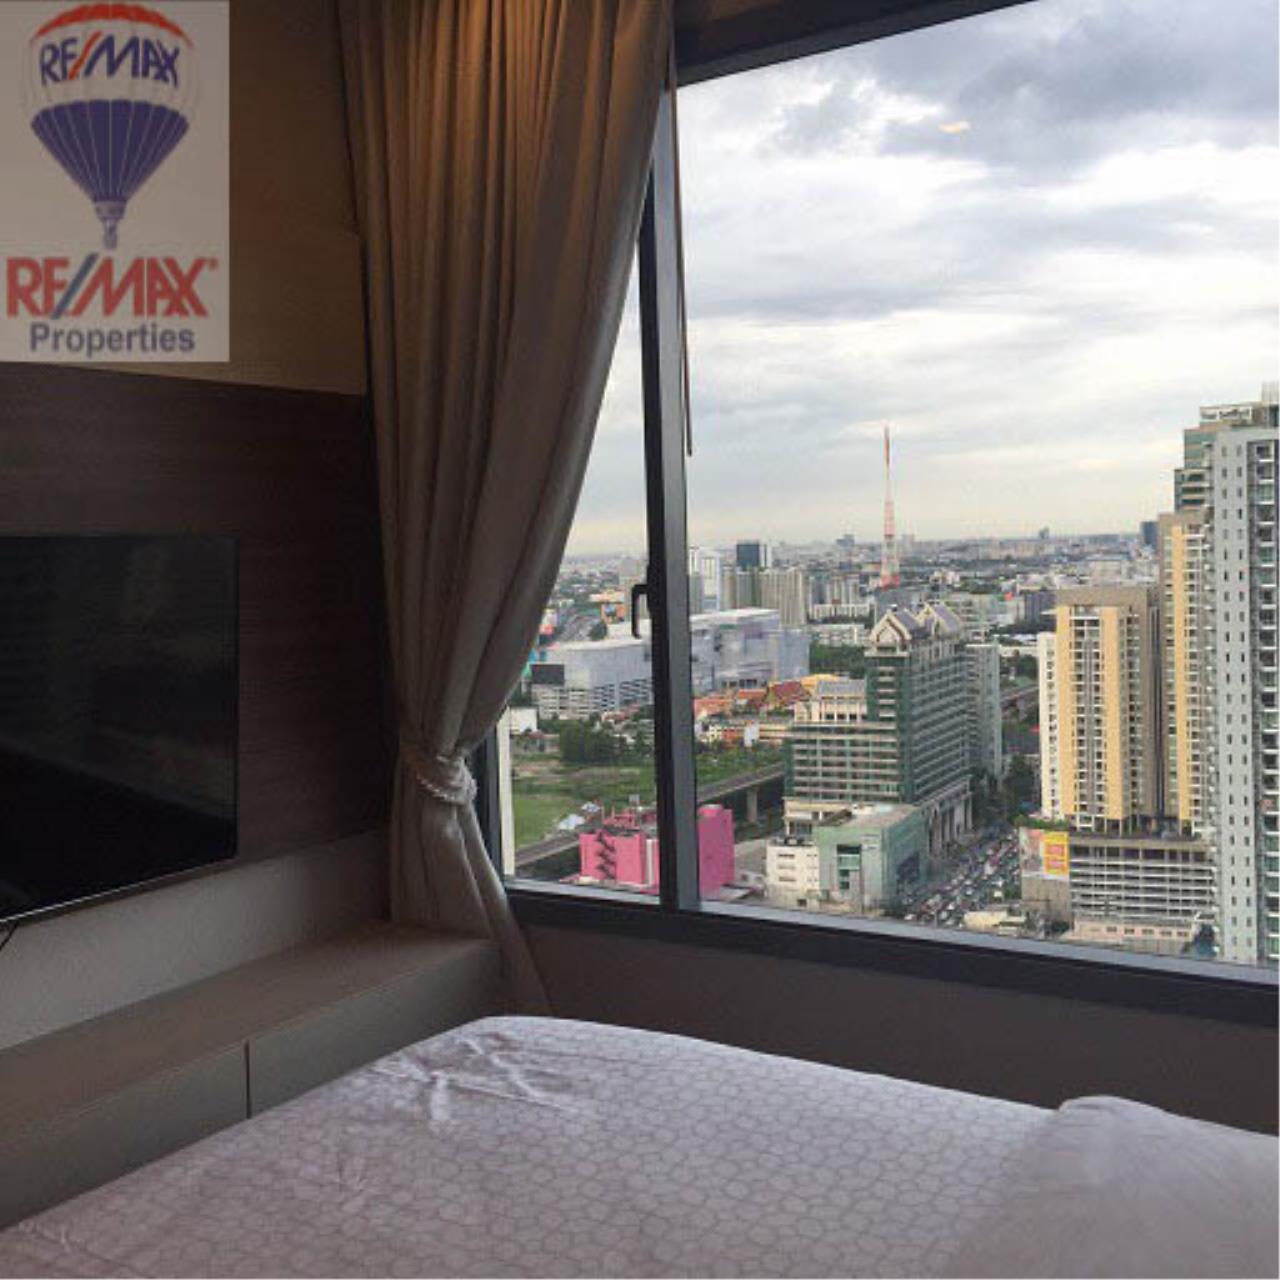 RE/MAX Properties Agency's Q Asoke 2 Bedroom For Sale 5